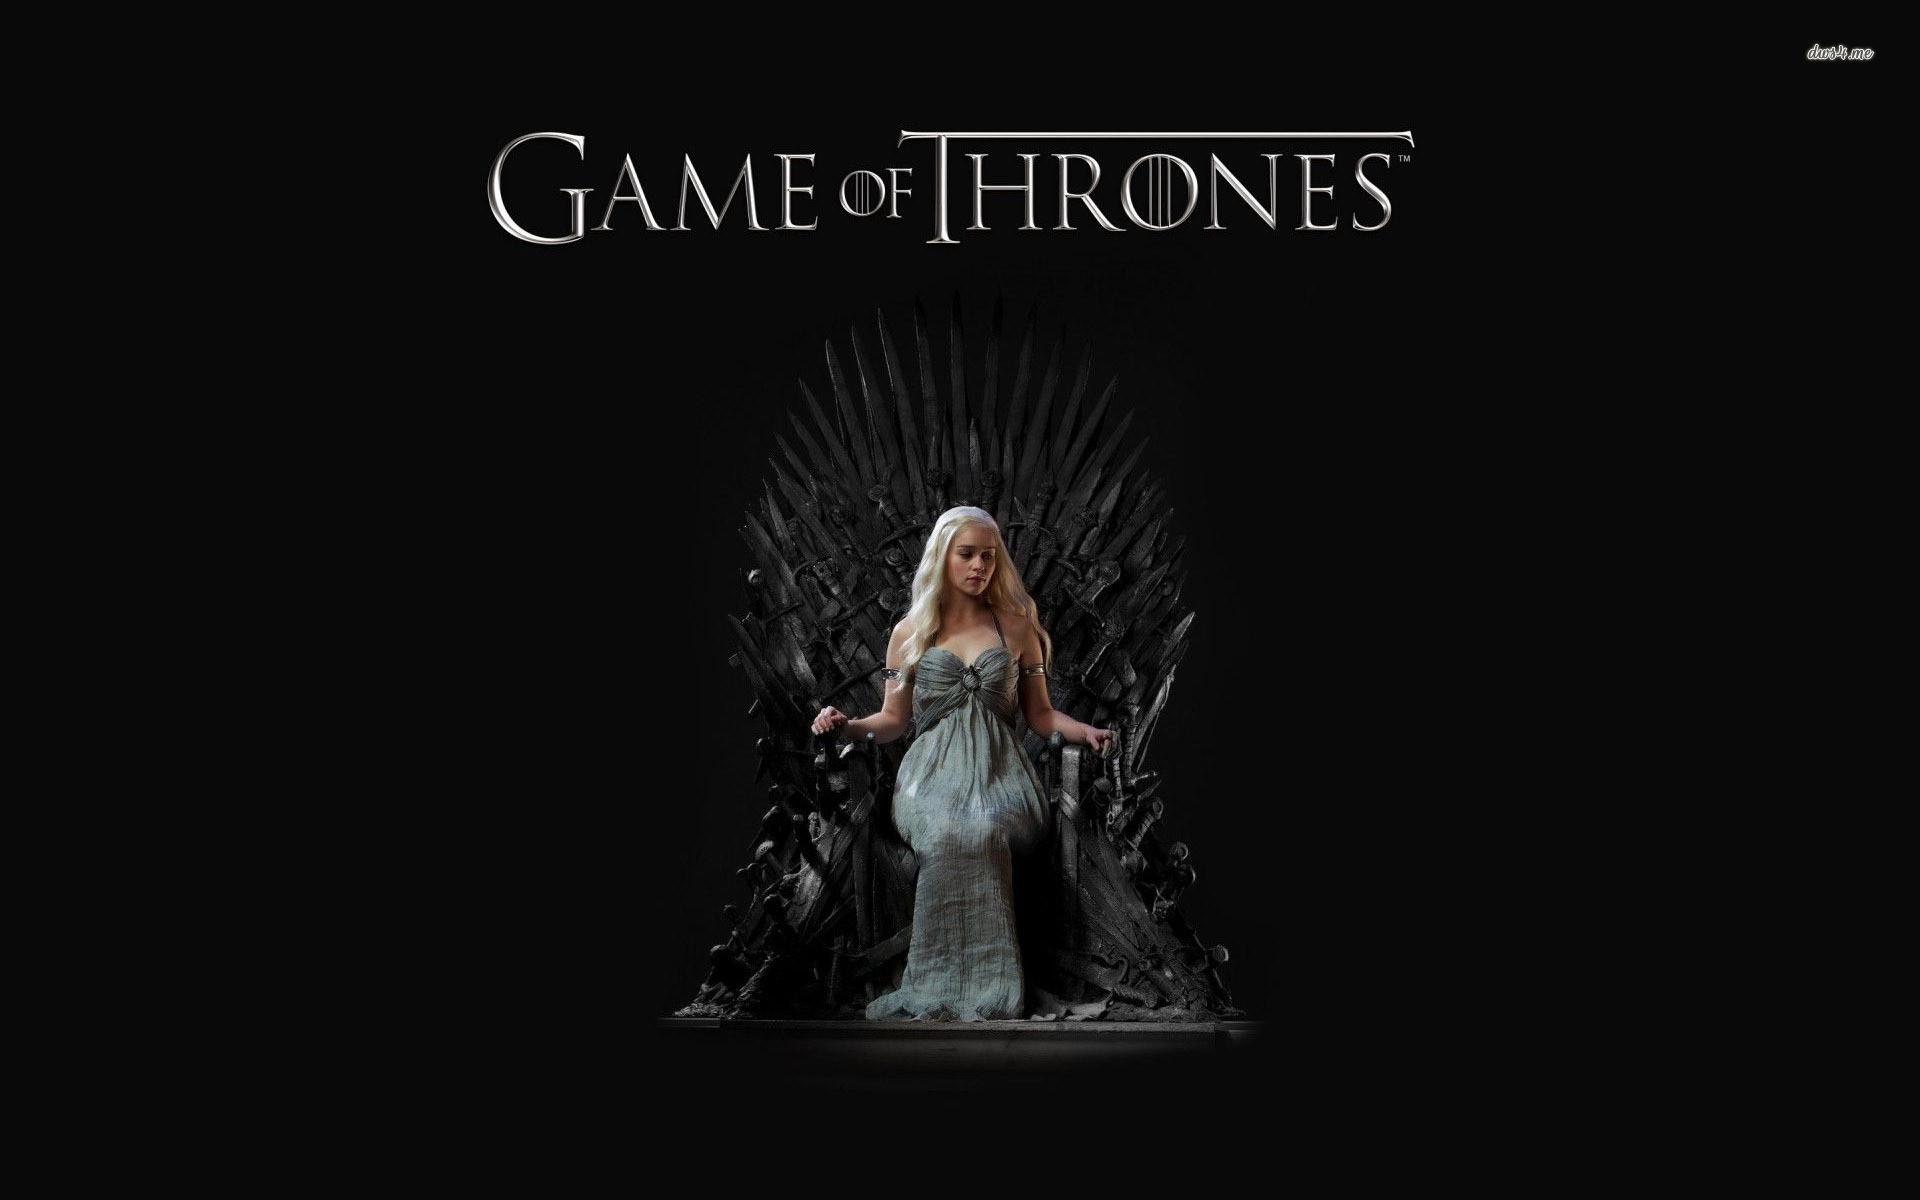 1920x1080 Game Of Thrones Wallpaper Hd 1080p